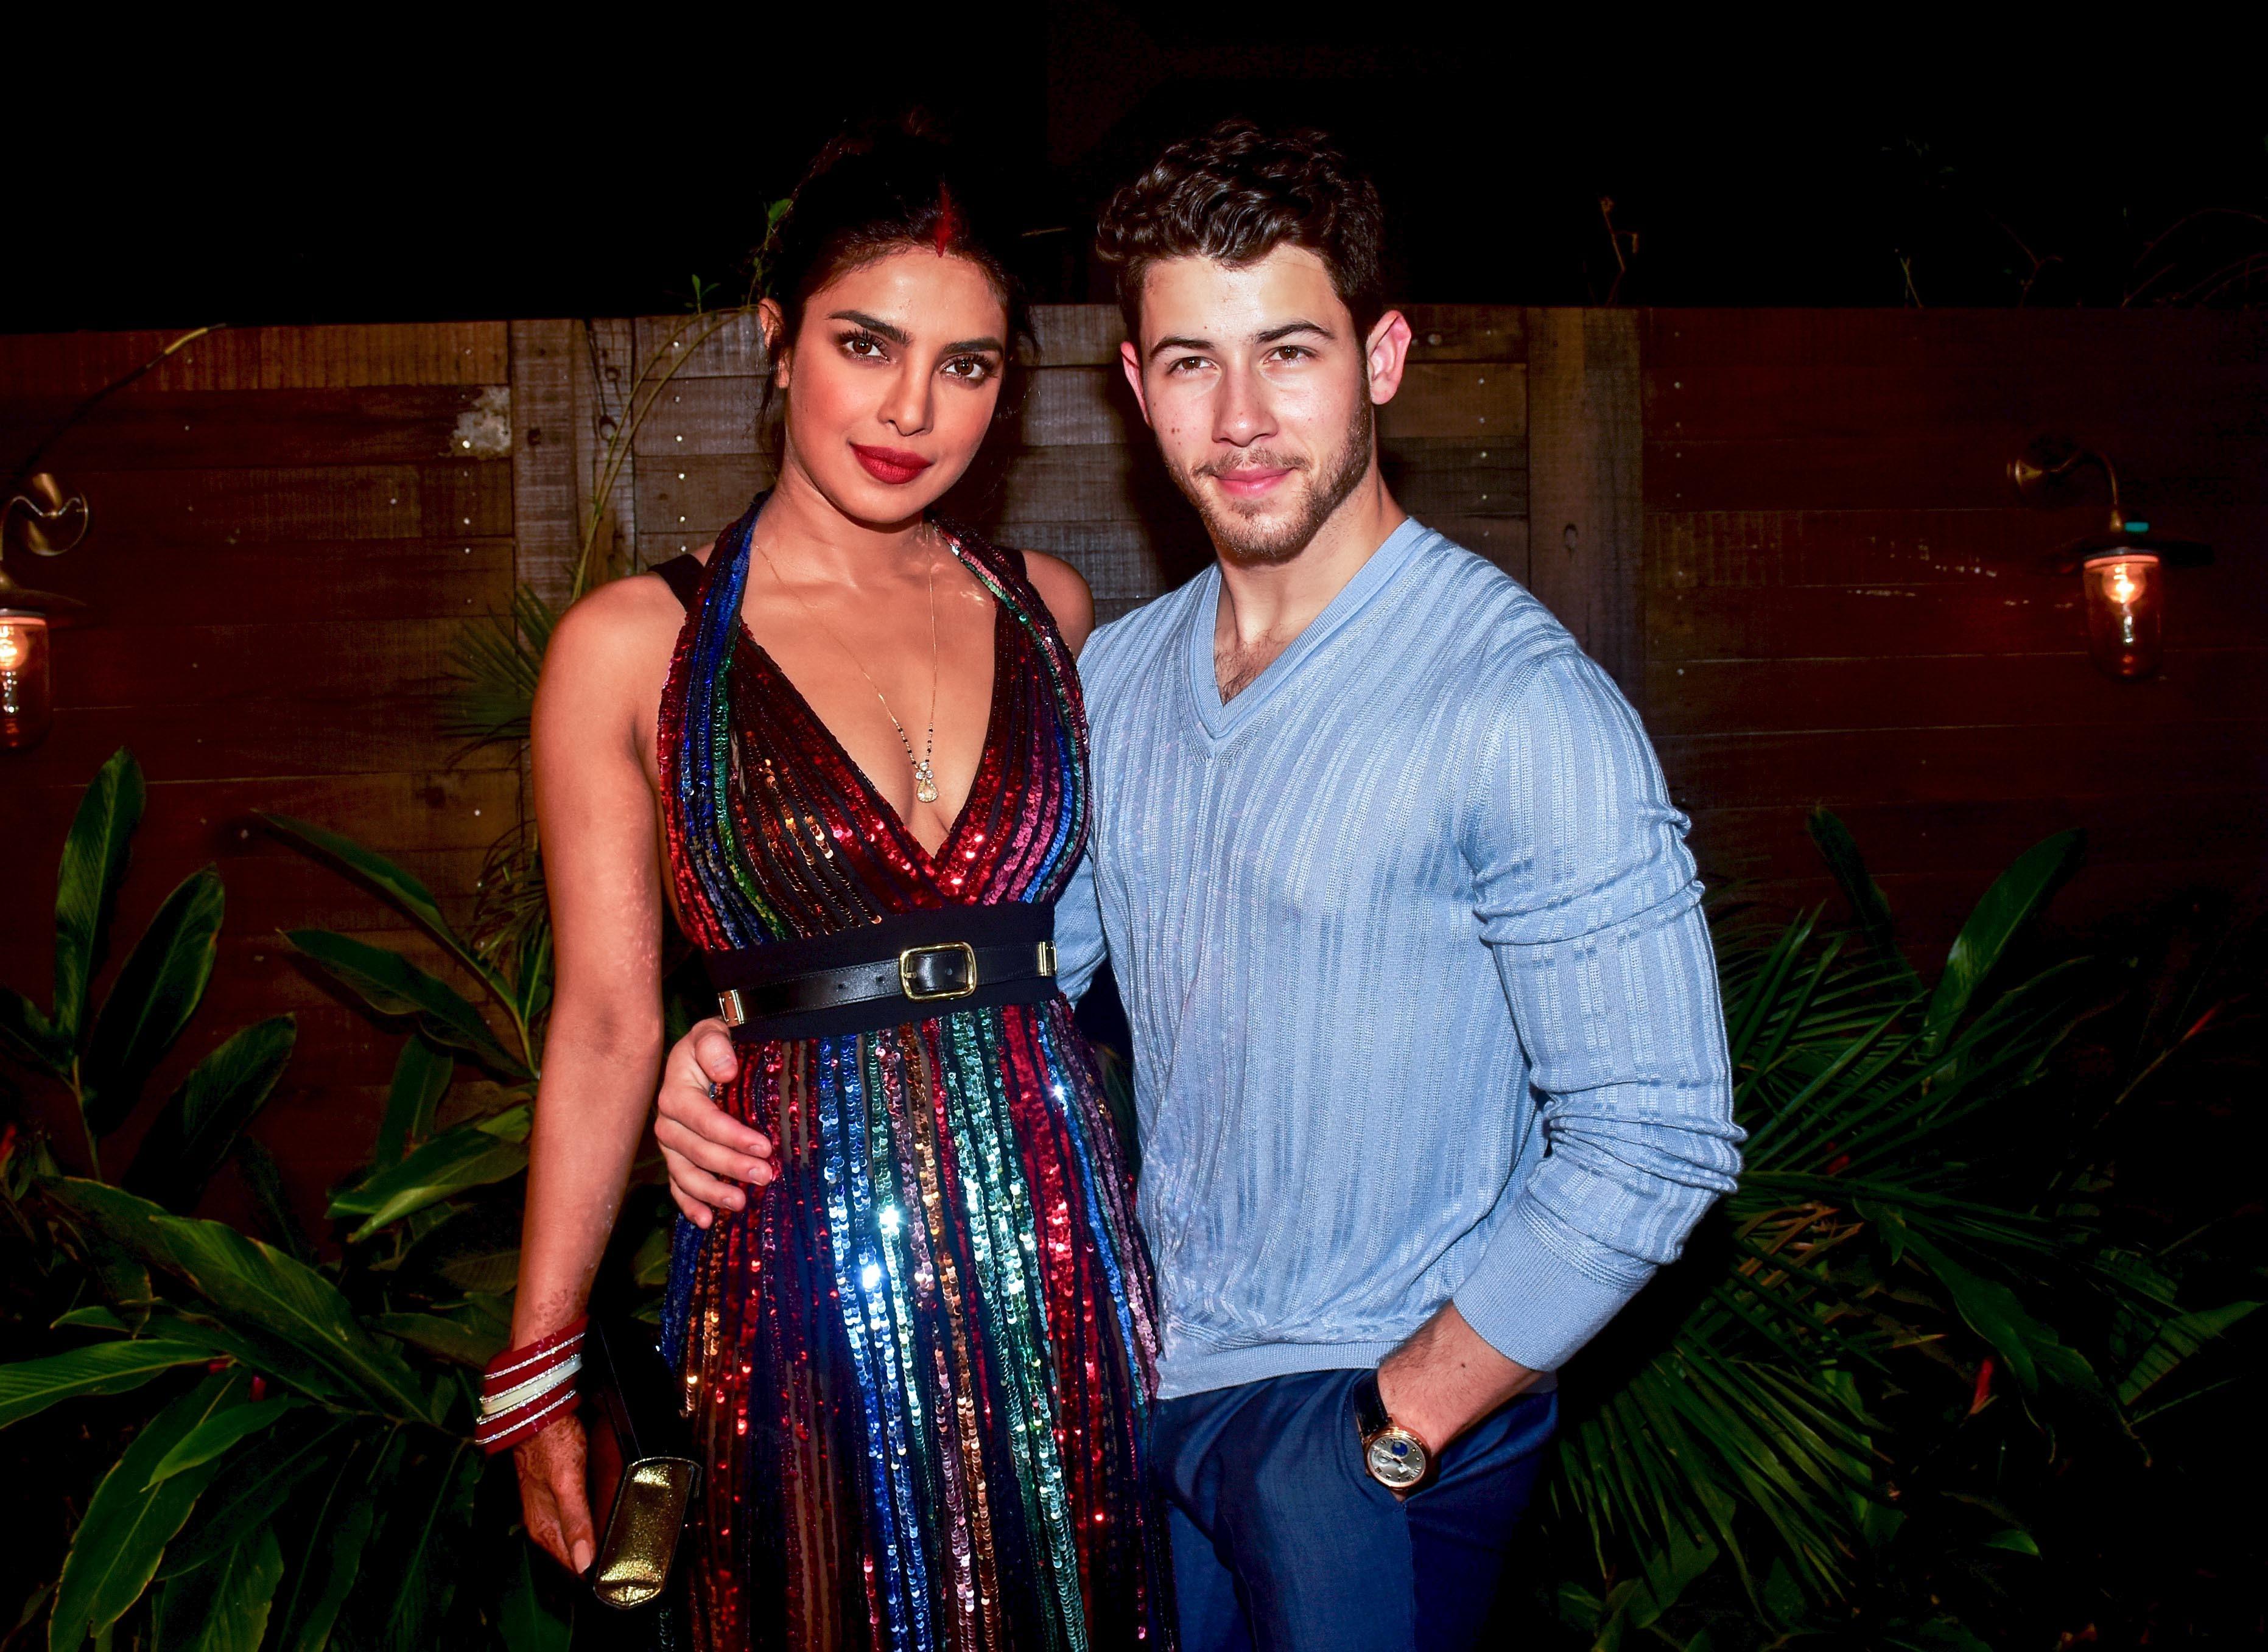 Priyanka Chopra and Nick Jonas pose at Bumble's India launch party at Soho House, Juhu in Mumbai on Dec. 7, 2018.